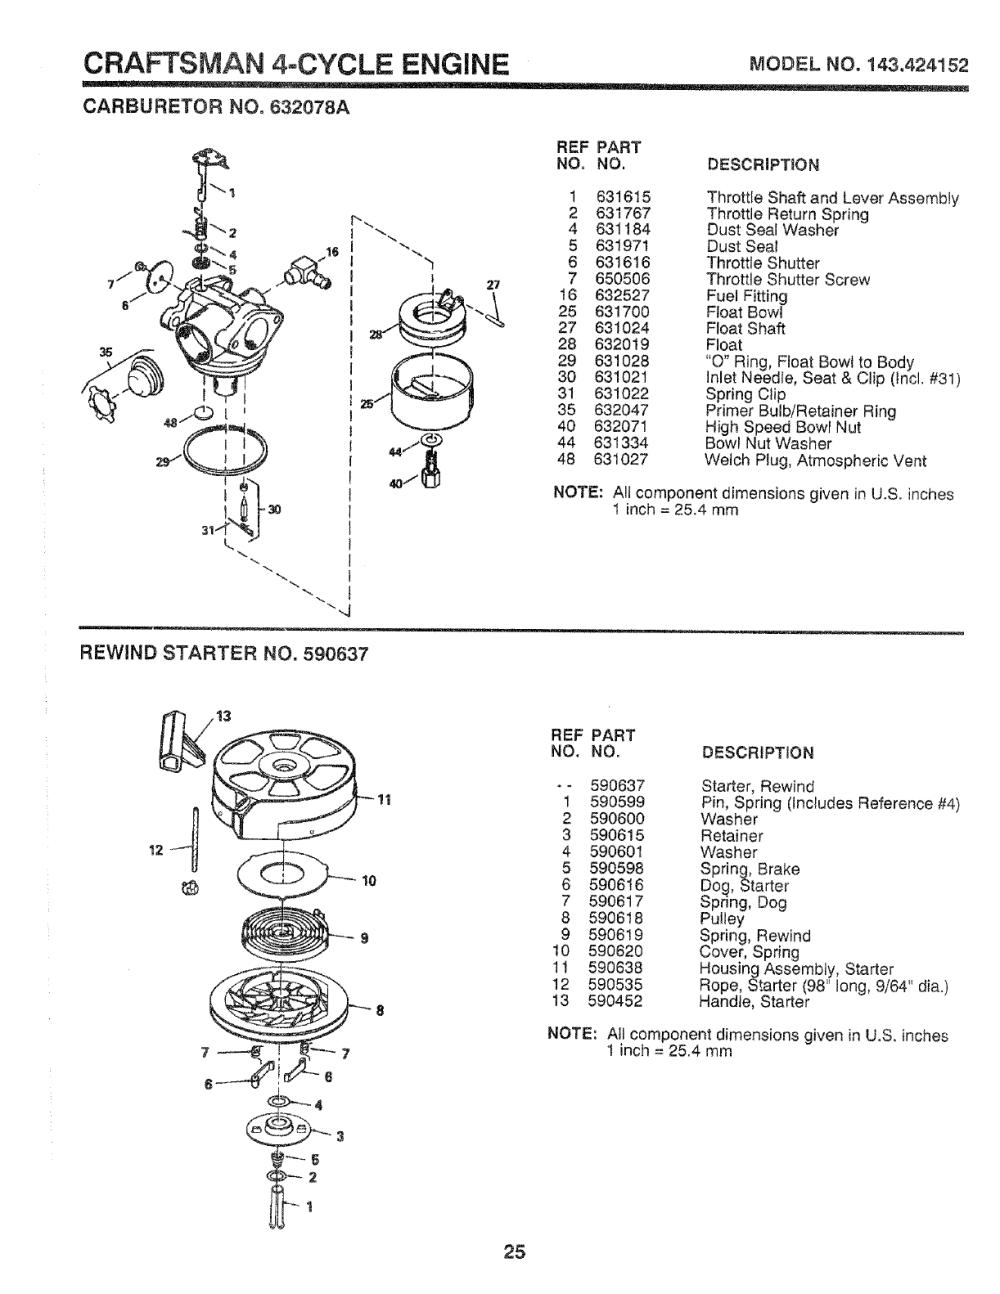 medium resolution of craftsman 917 37248 craftsman 4 cycle engine modelno 143 424152 carburetorno 632078a